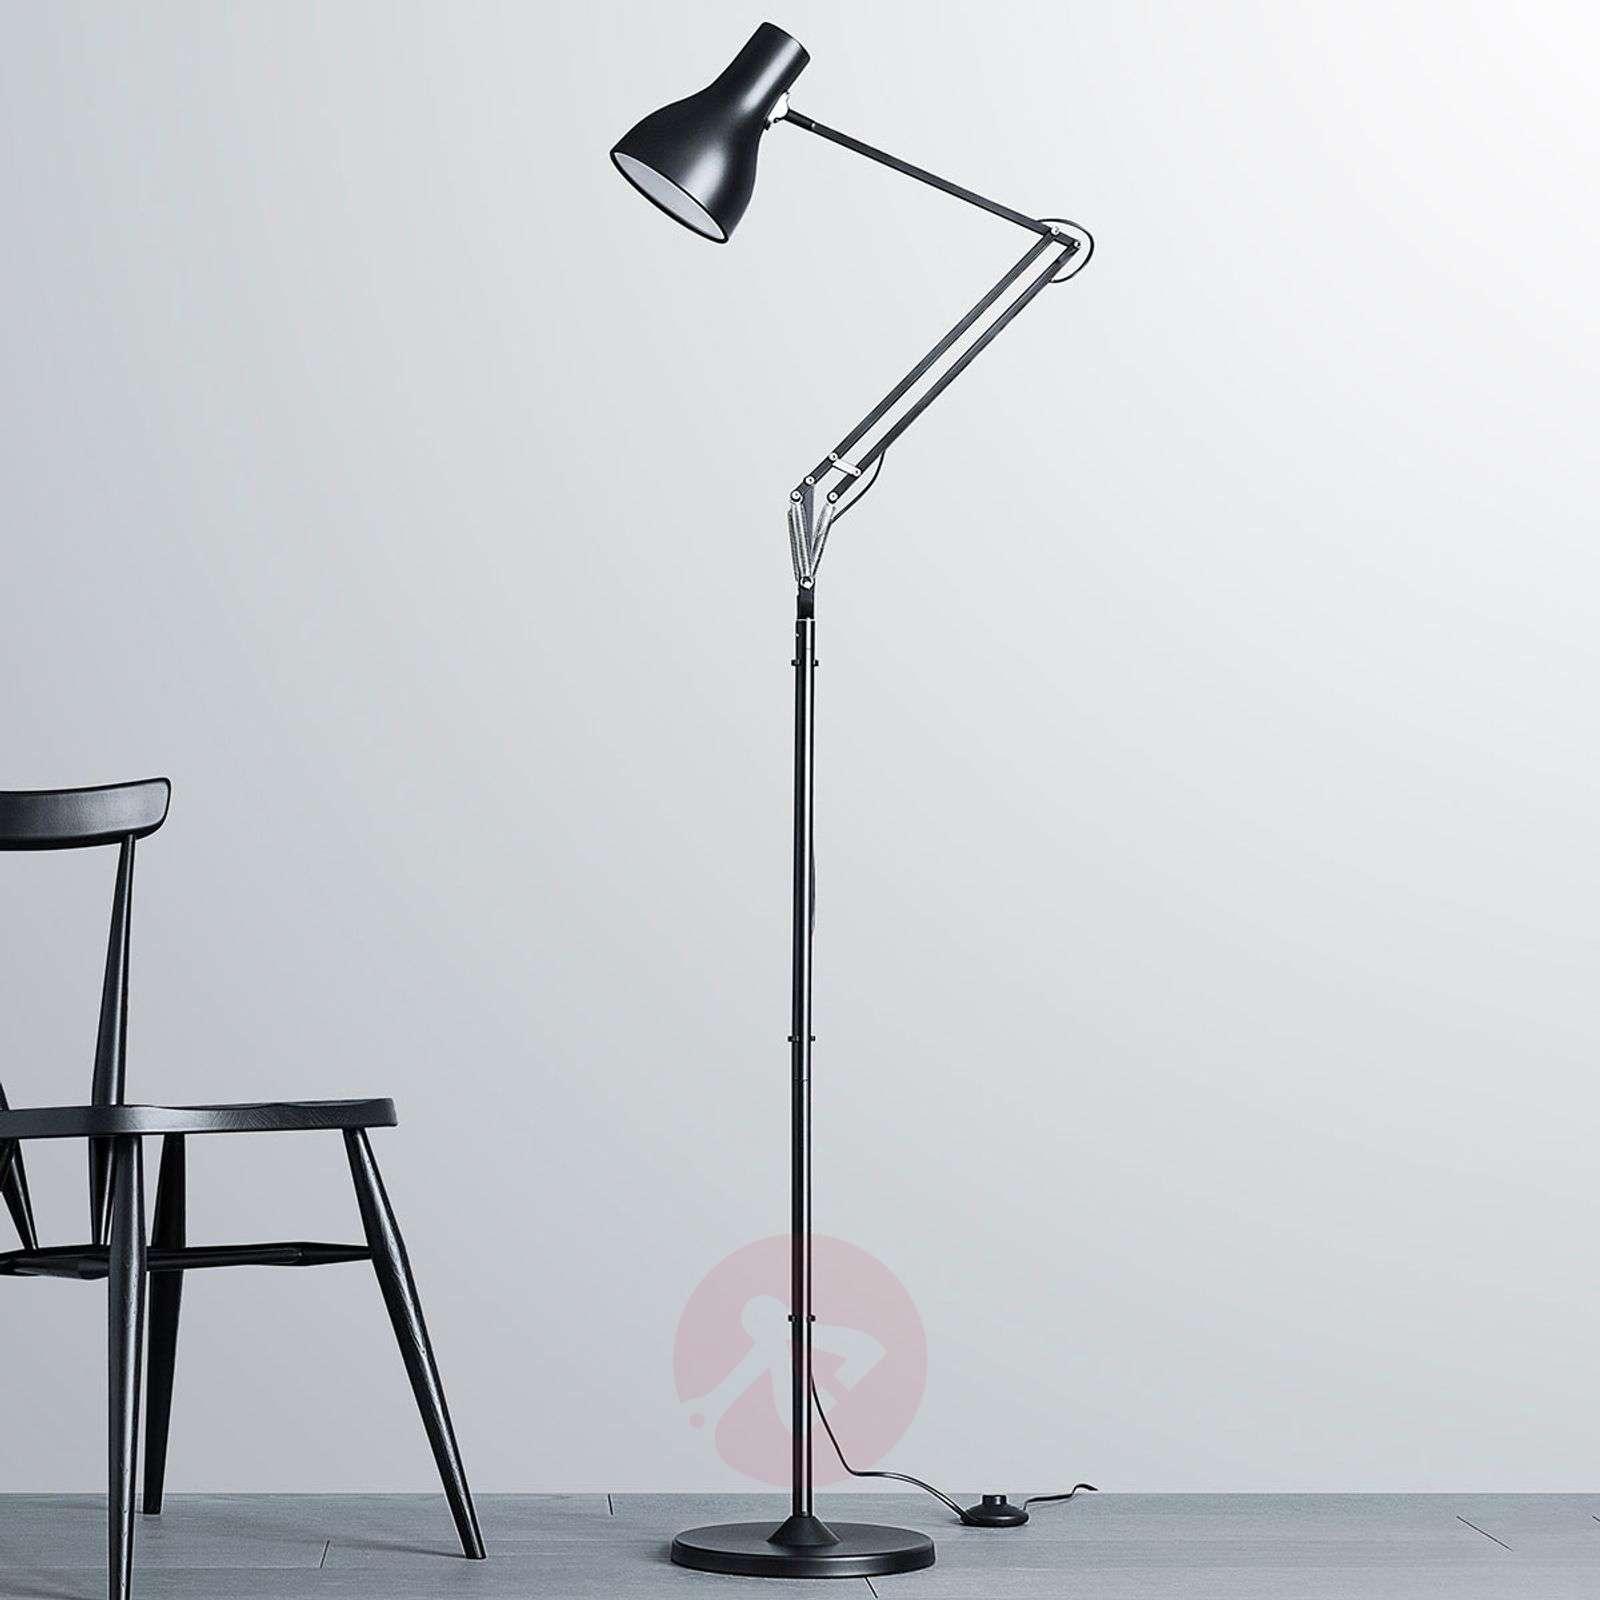 Anglepoise Type 75 floor lamp-1073073X-01